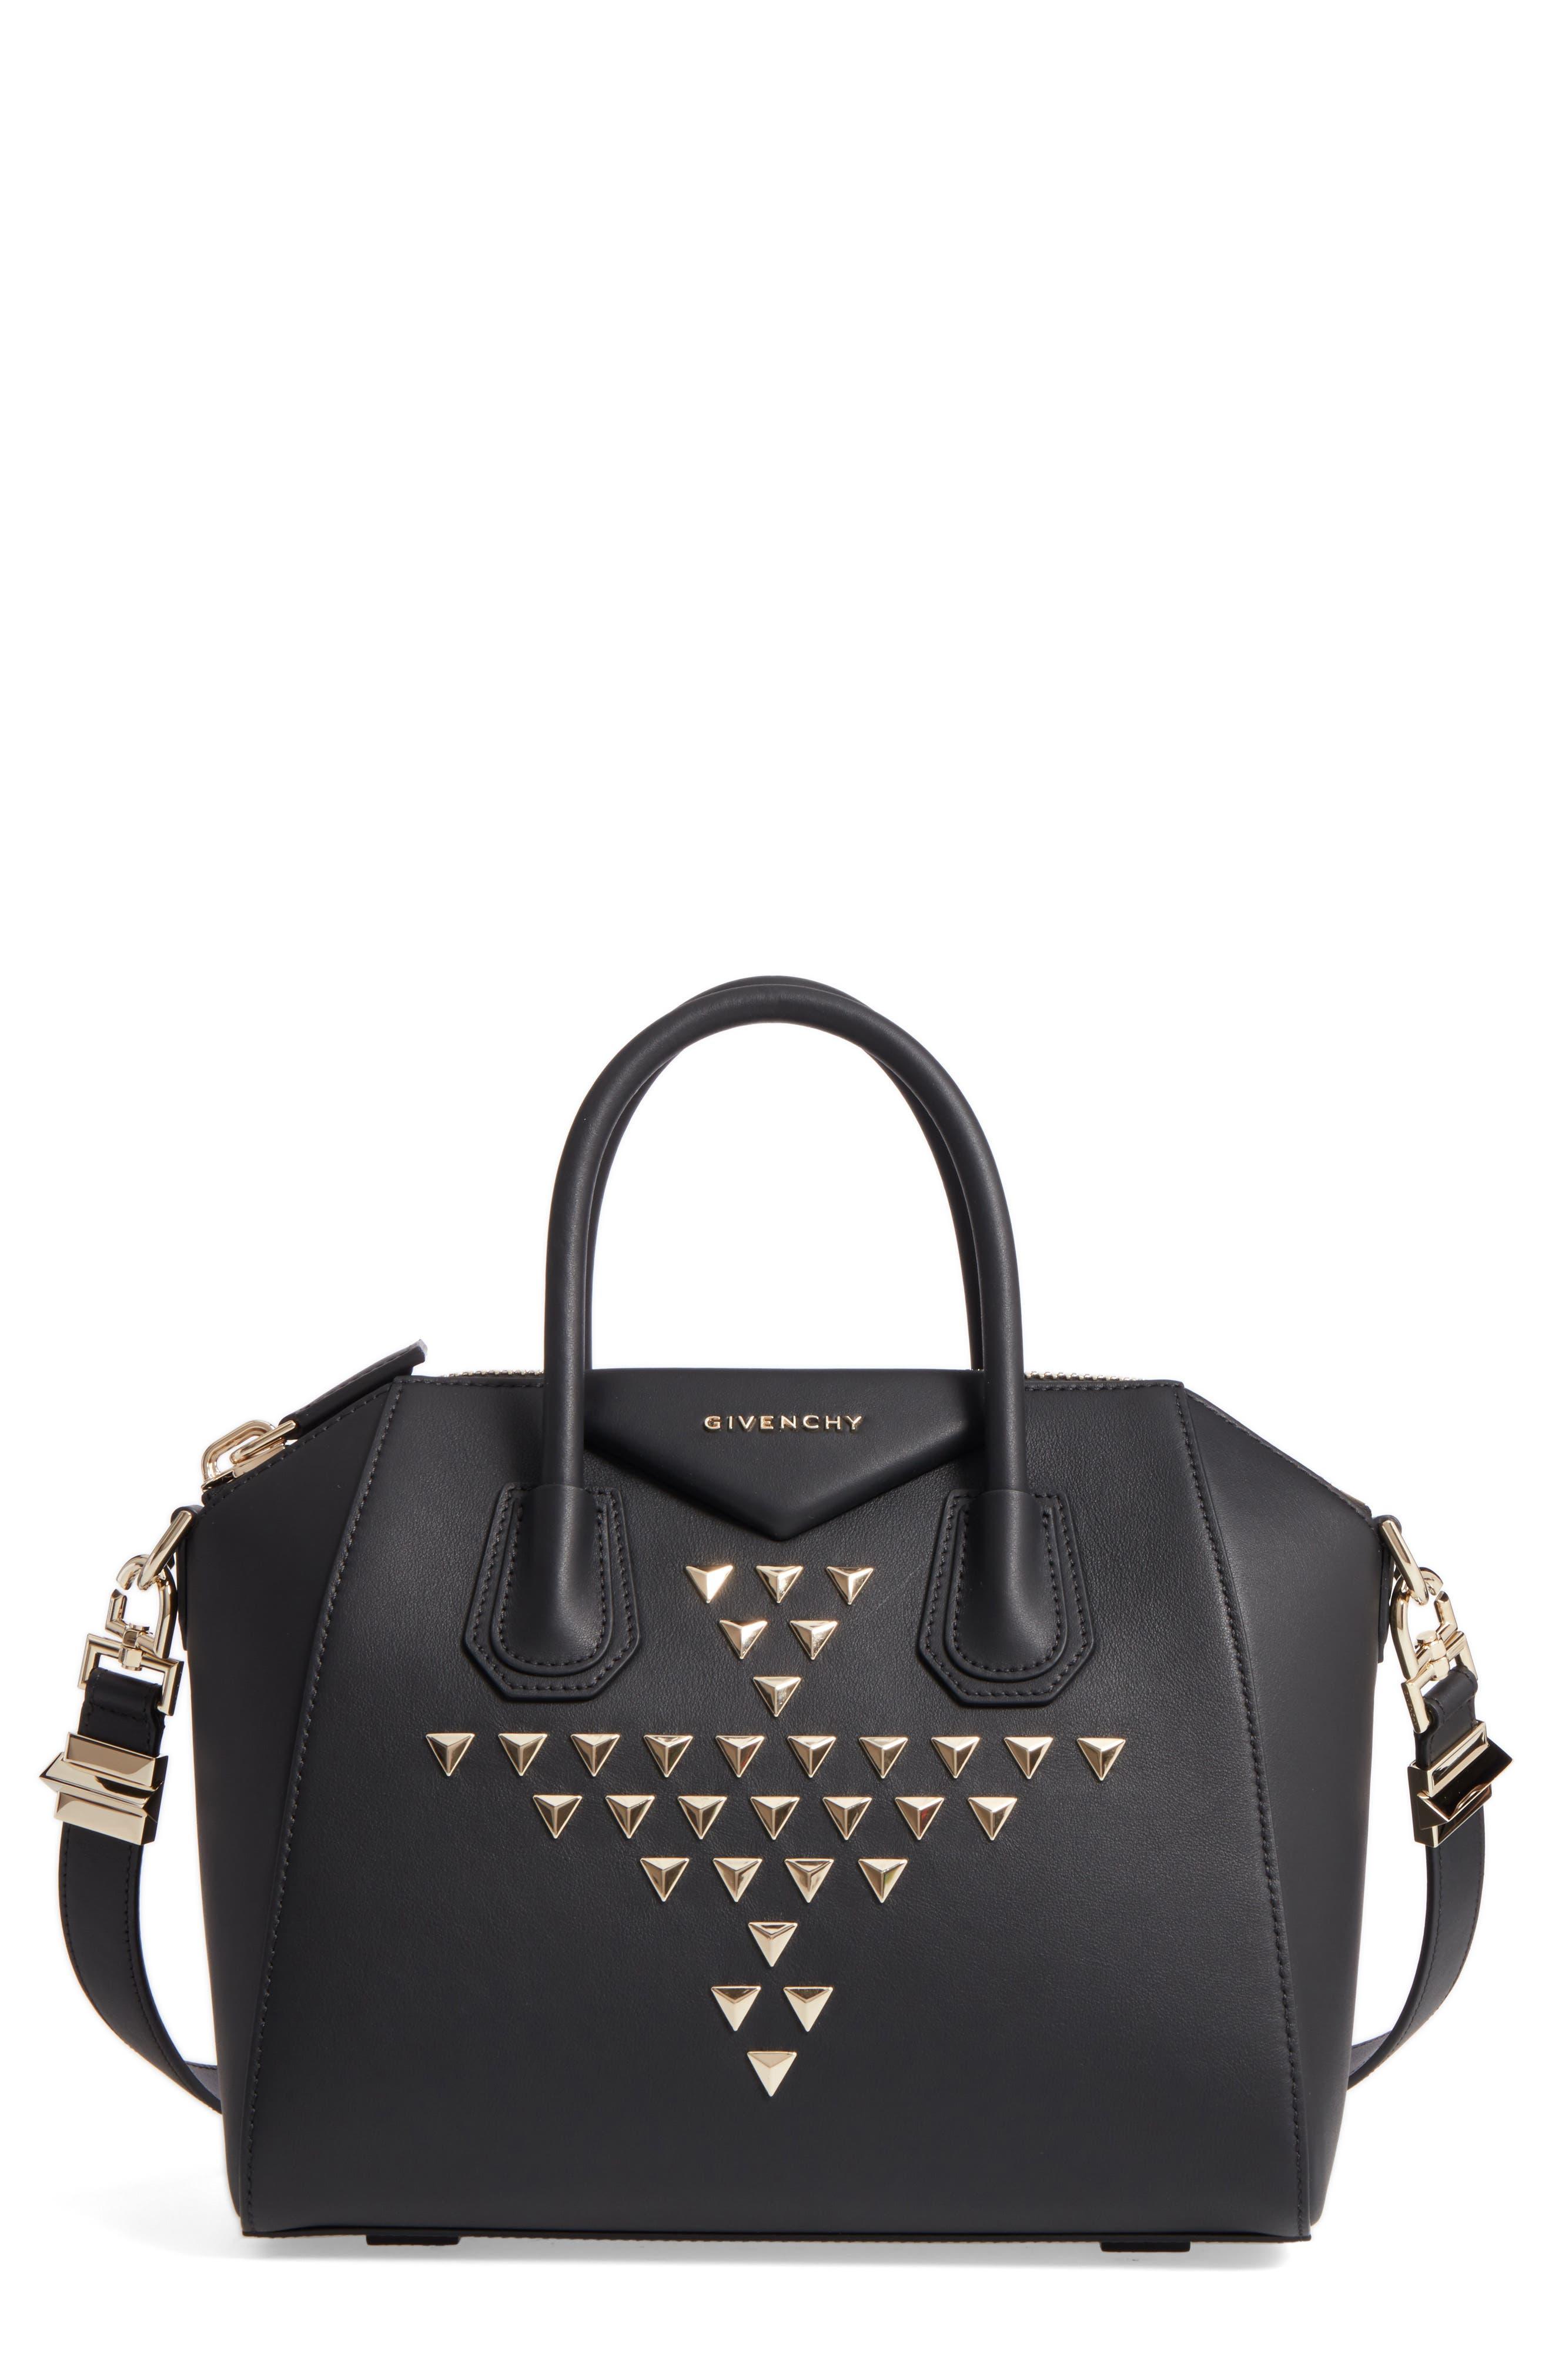 Givenchy Small Antigona Studded Calfskin Leather Satchel